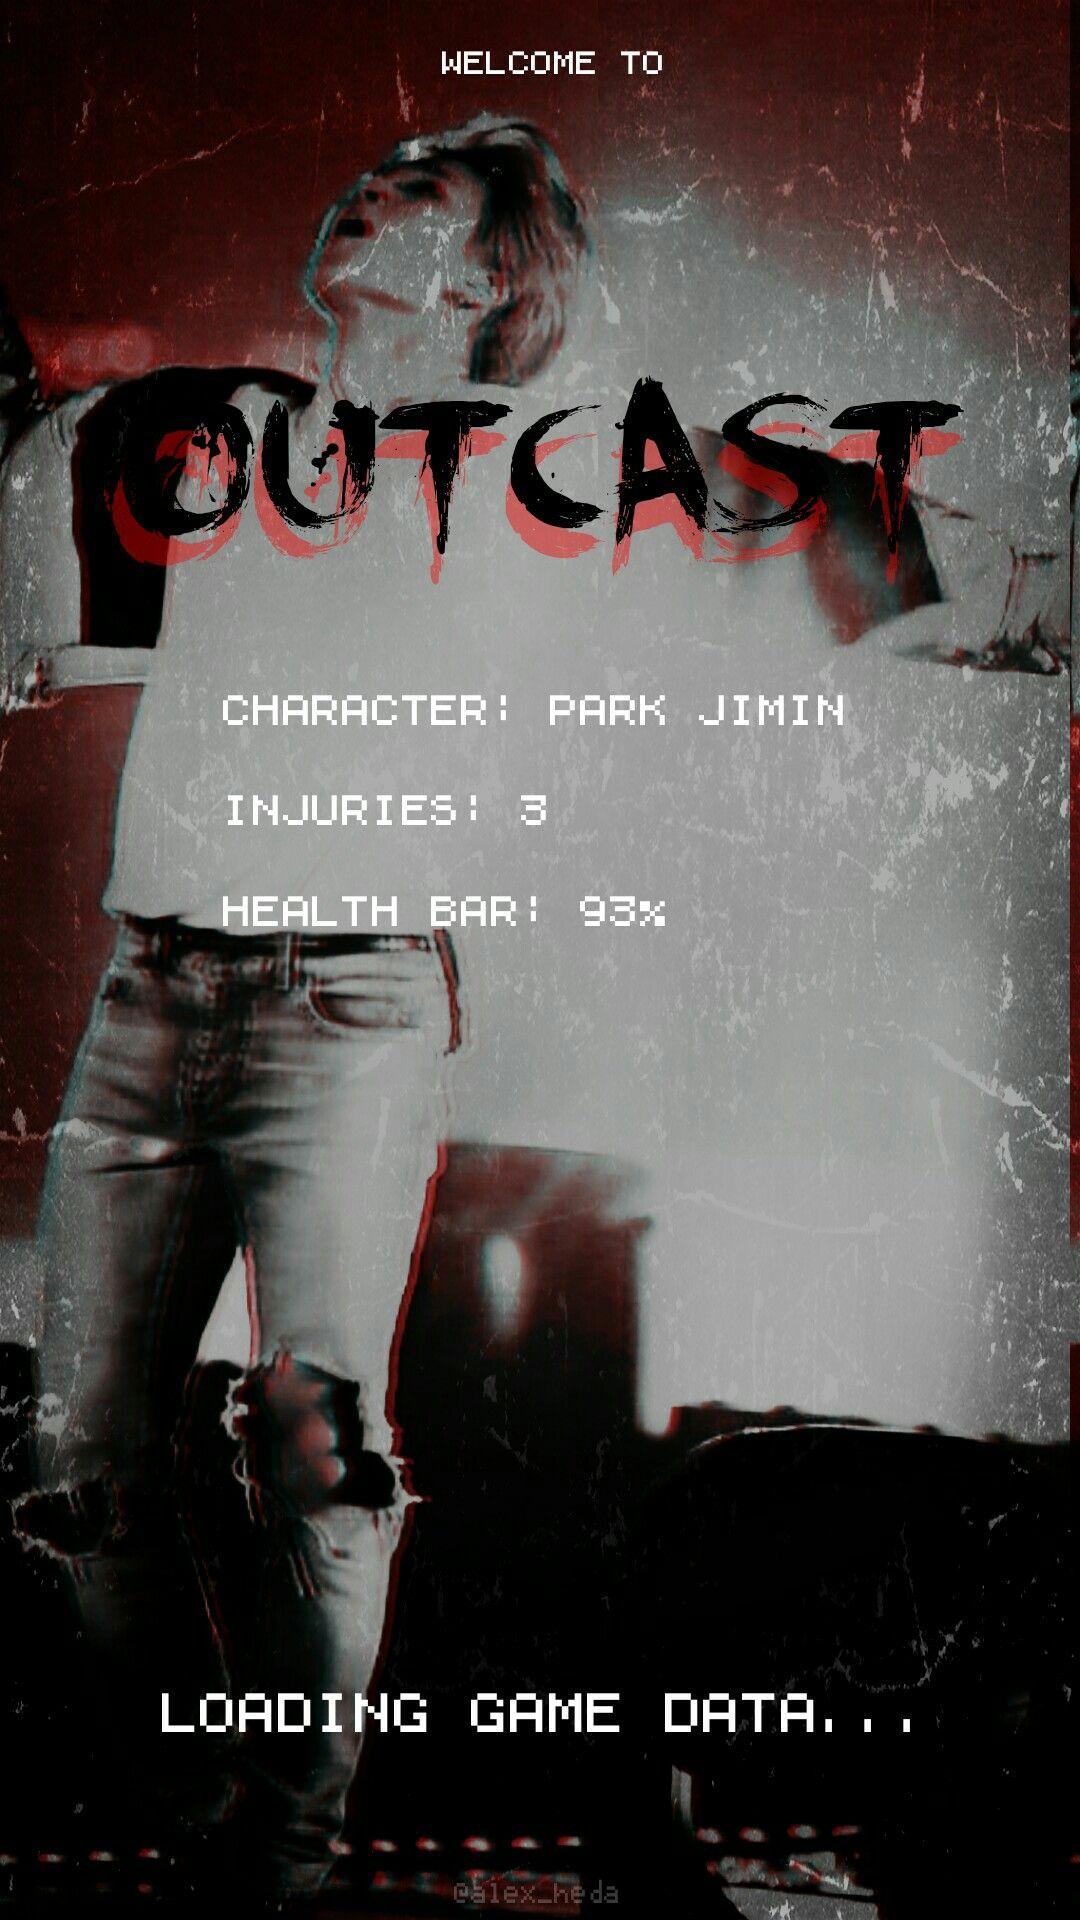 Park Jimin Outcast BTS AU Lockscreen #jimin #bts #outcast